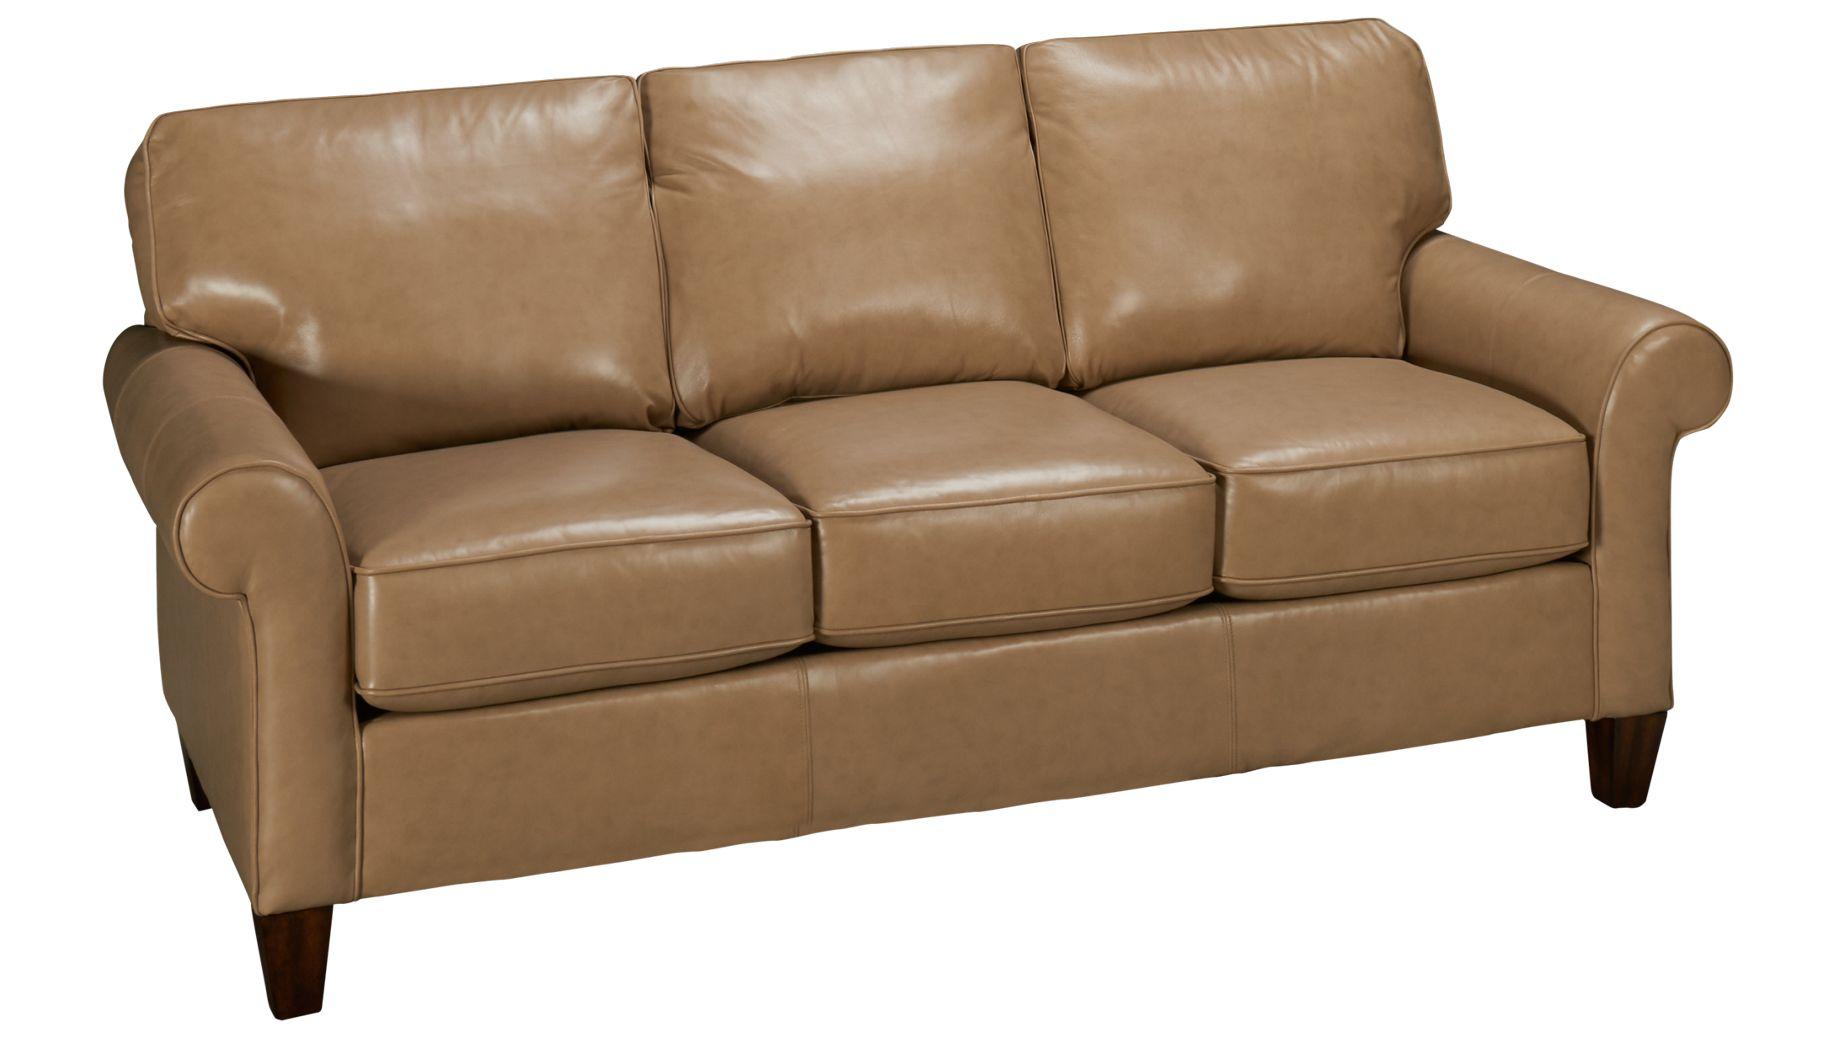 Flexsteel westside sofa reviews refil sofa for Sofa jordsand